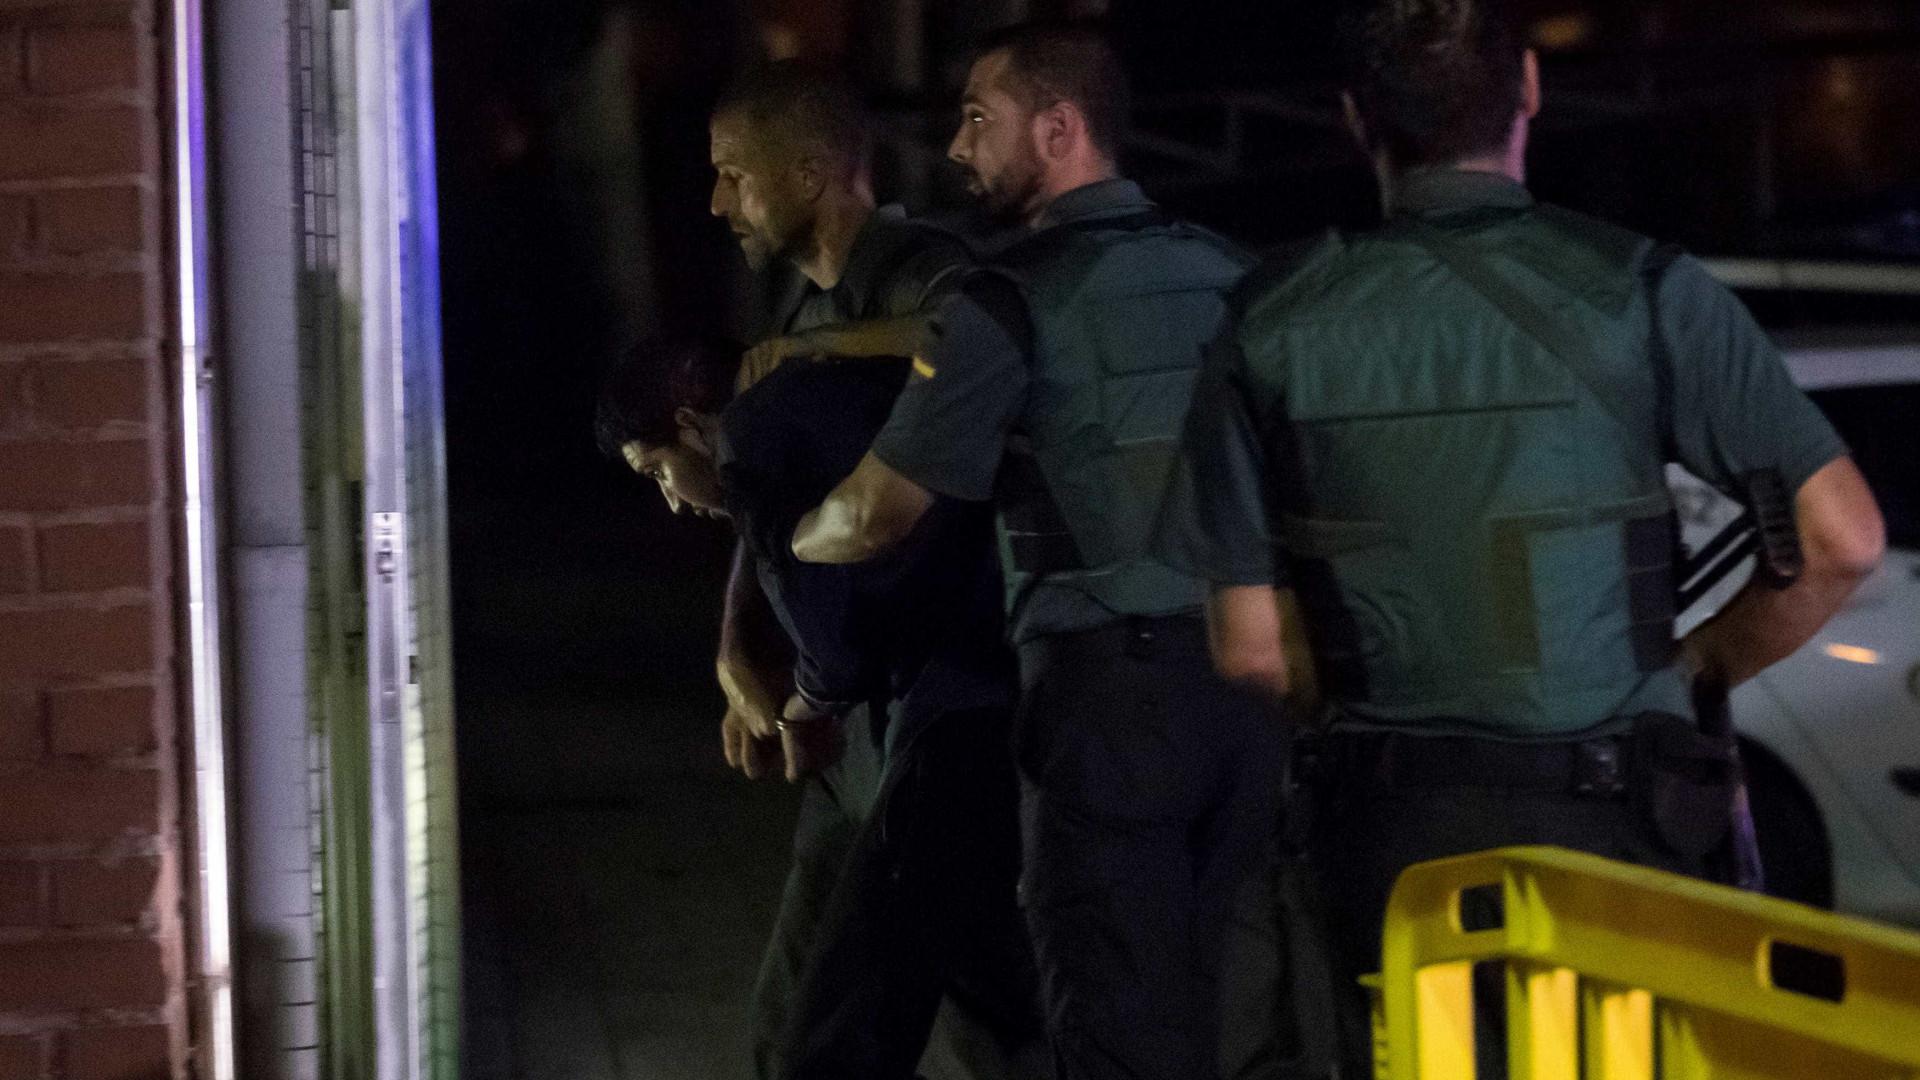 Terrorista confessa: Ideia era atacar a Sagrada Família